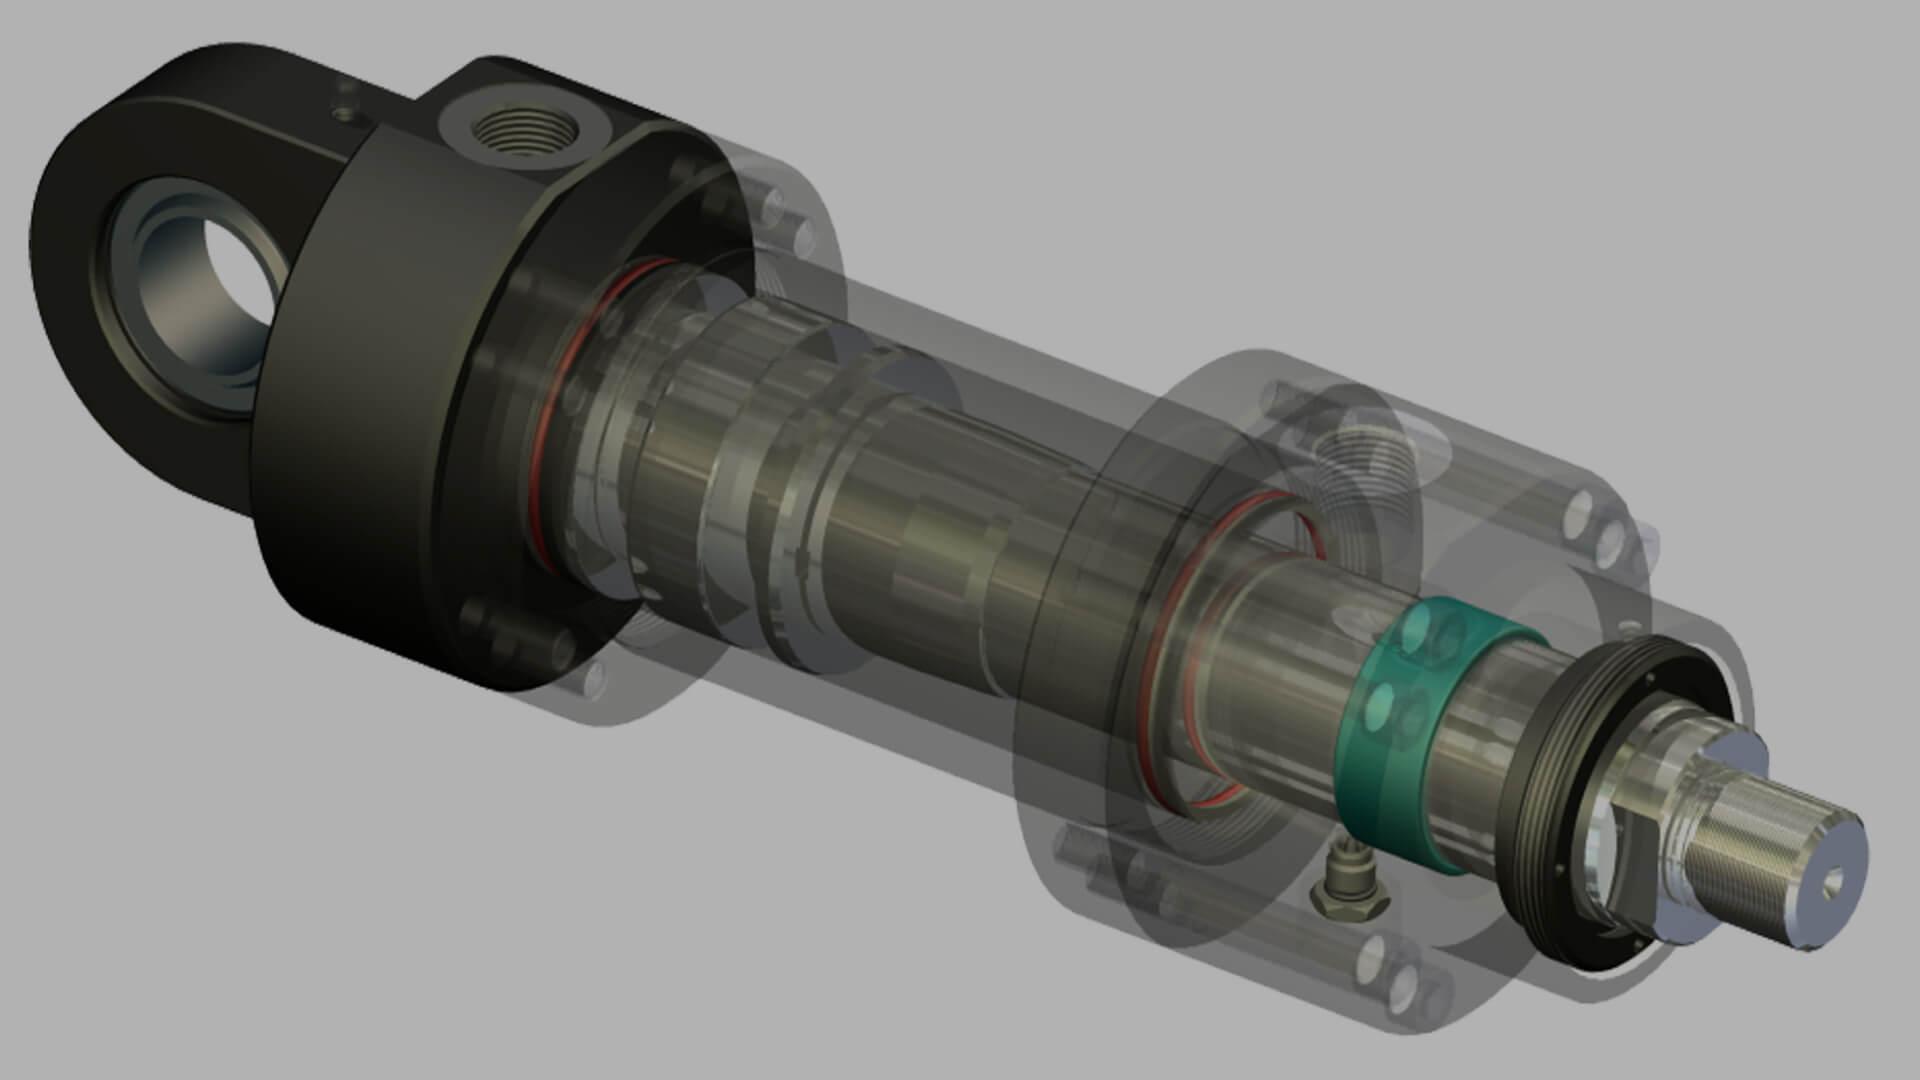 hydromat's hydraulic systems